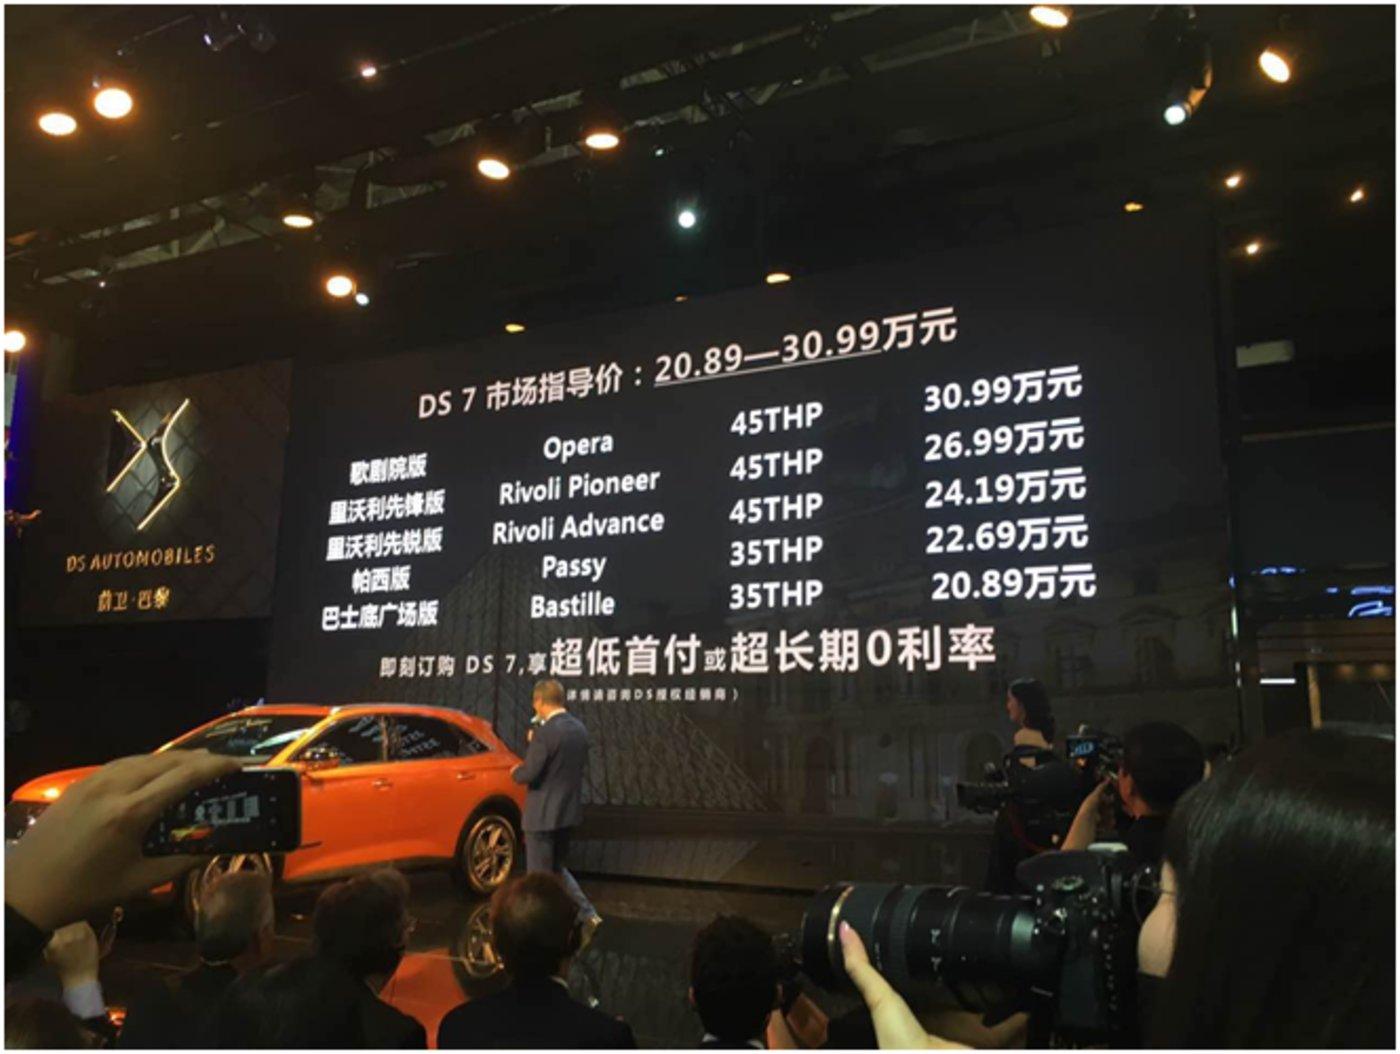 DS 7 北京车展上市公布价格